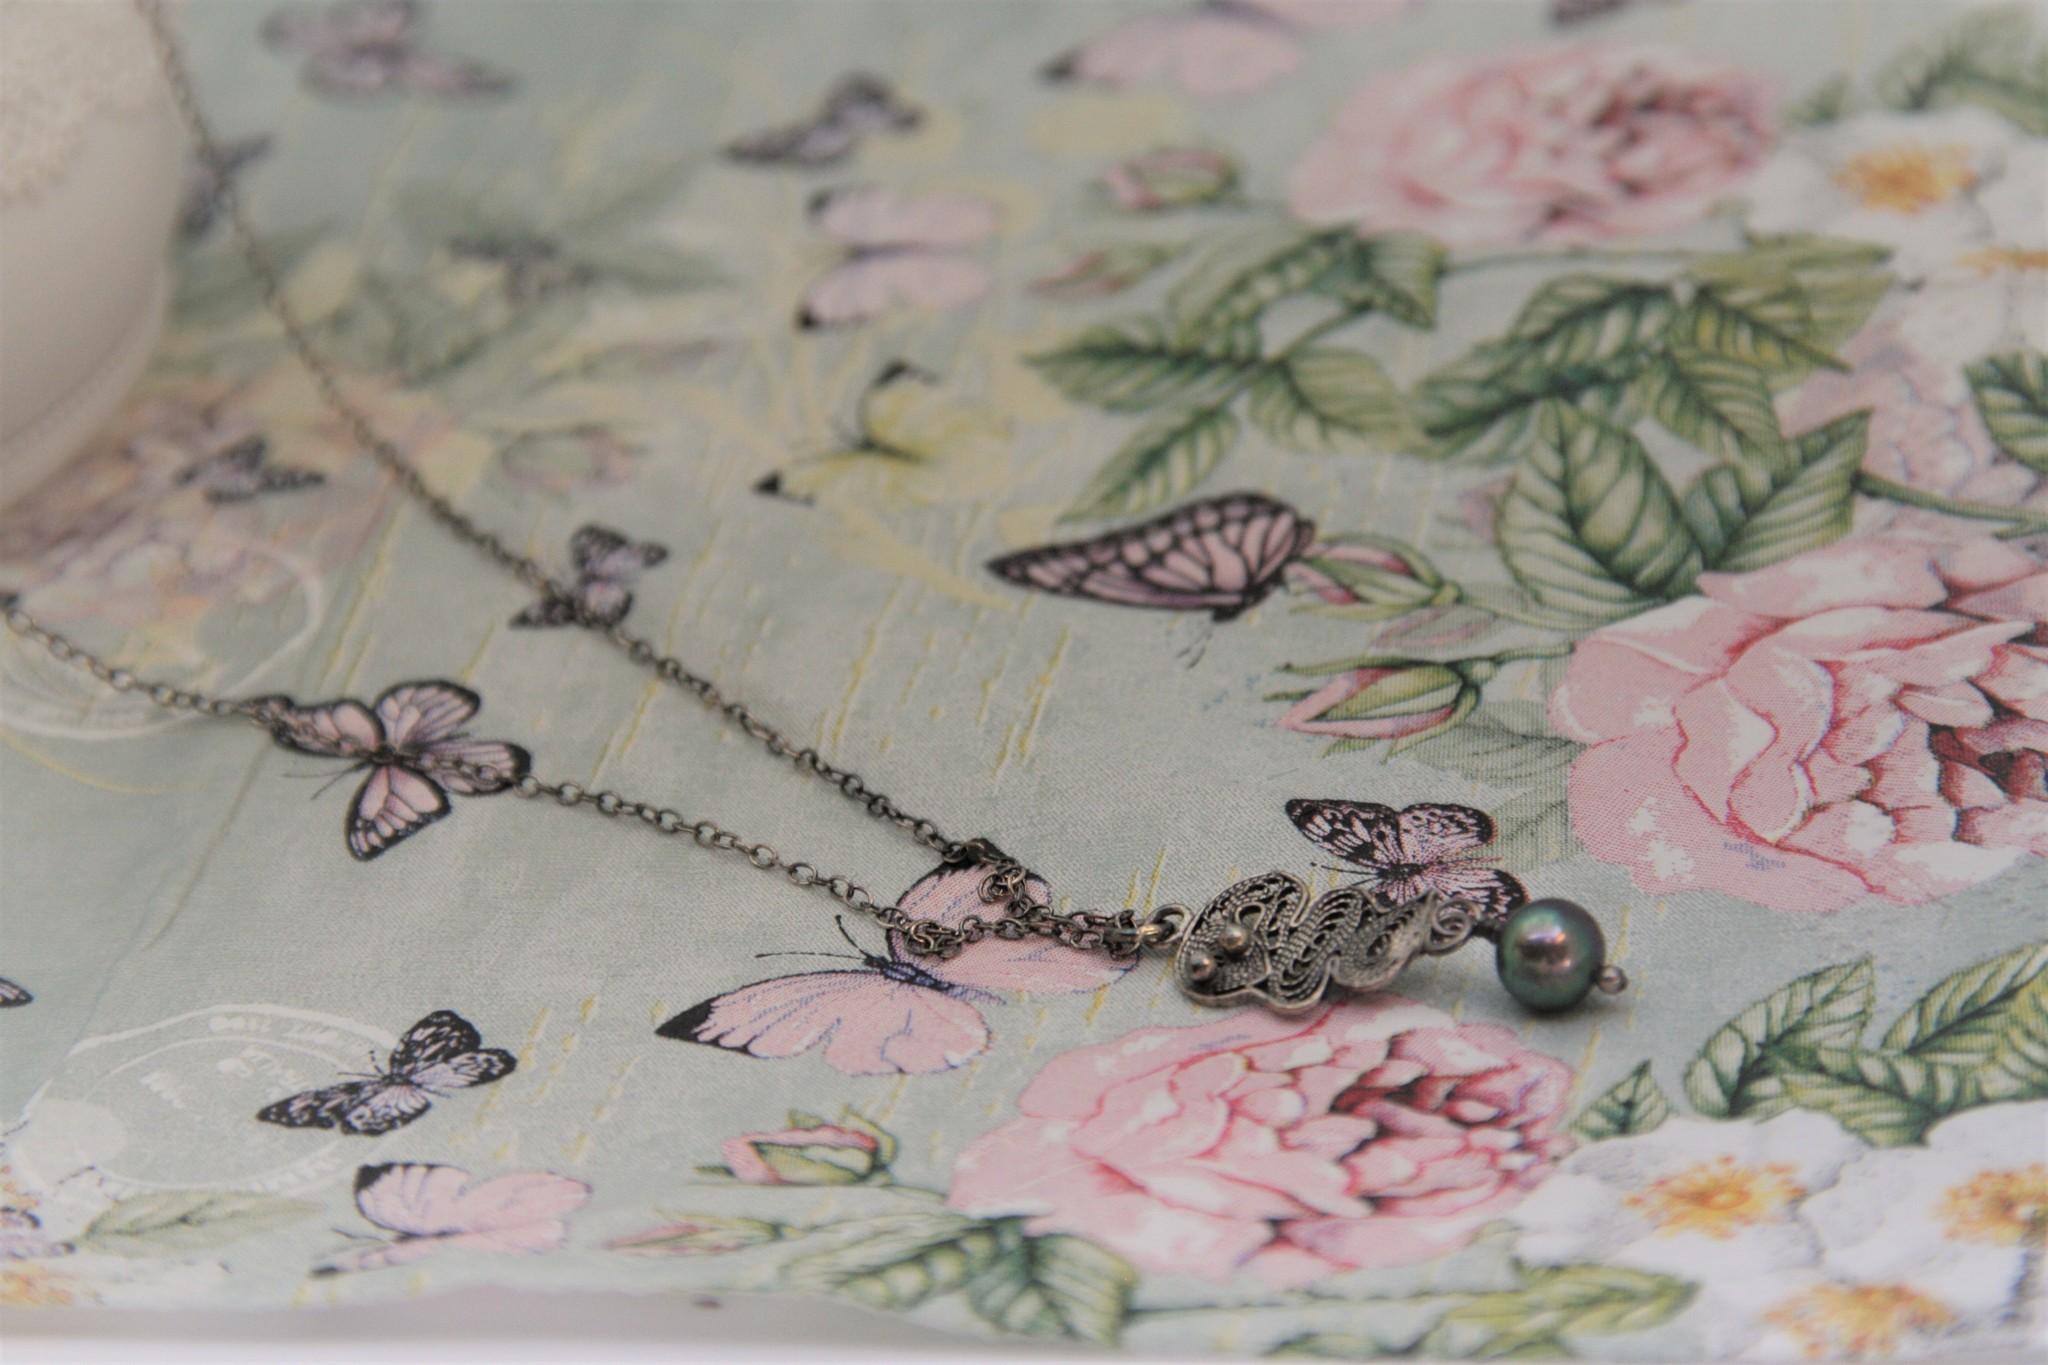 Yvone Christa Fine Yvone Christa necklace with grey pendant